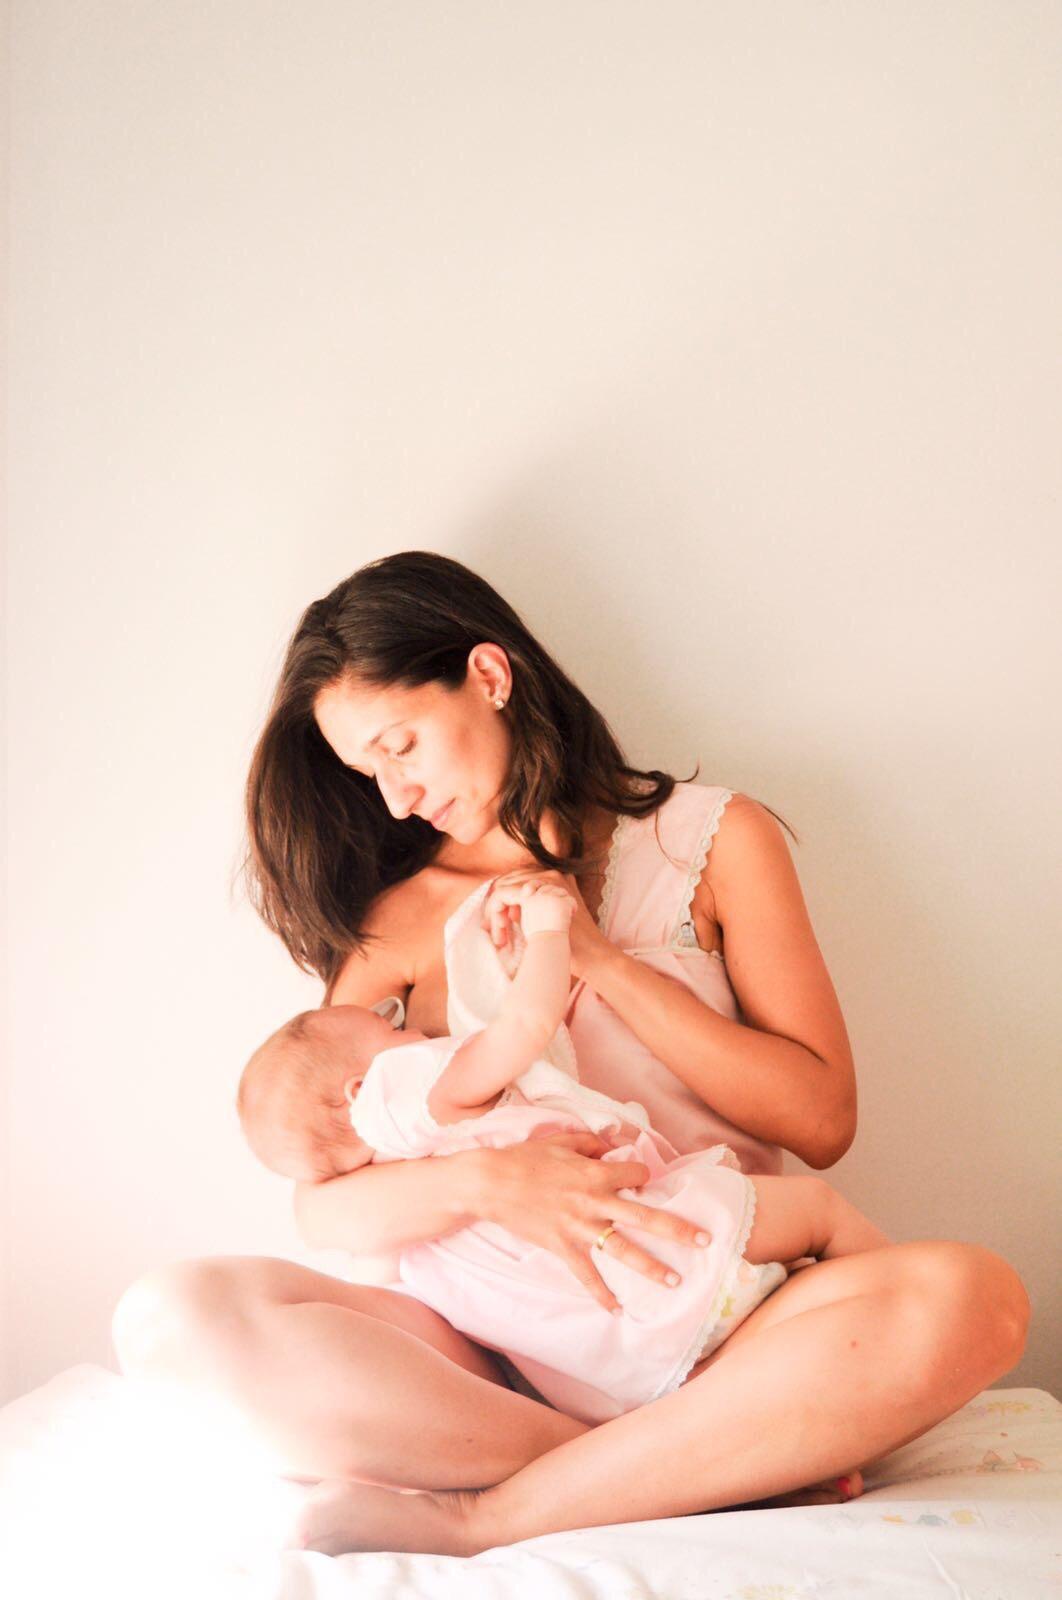 Criar en brazos